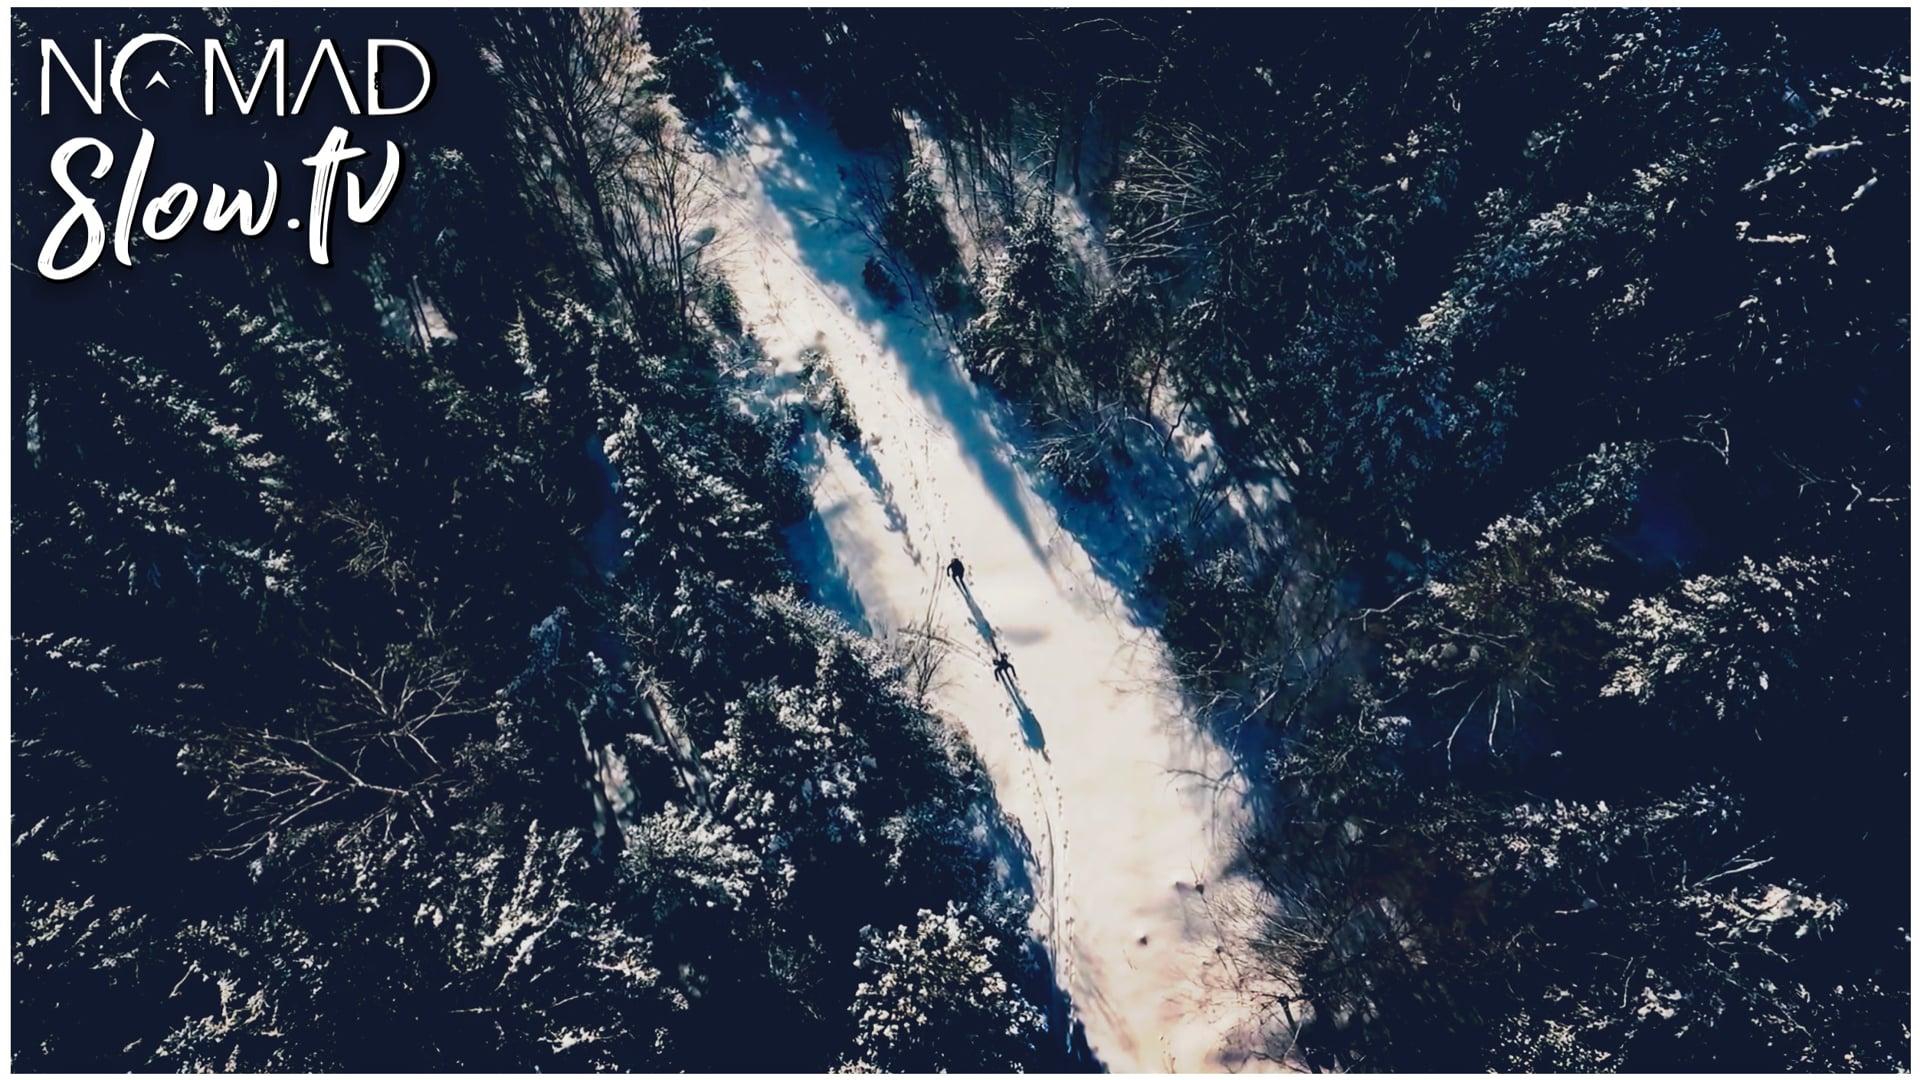 Heli Drone Images - Ski de Fond